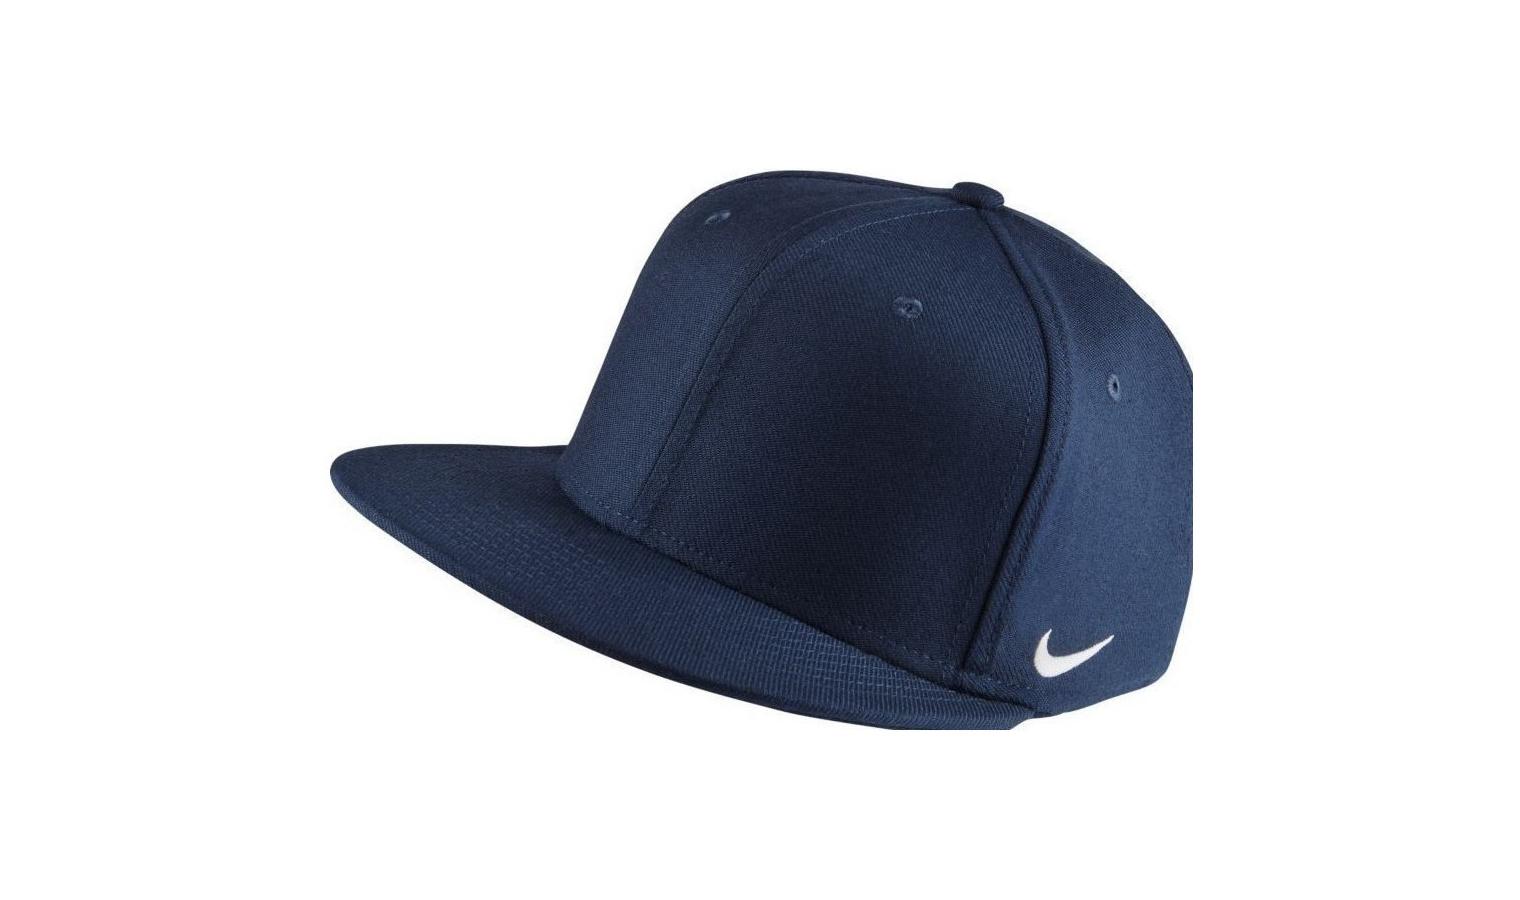 Pánská kšiltovka Nike TRUE SWOOSH FLEX CAP modrá  9042a43f99